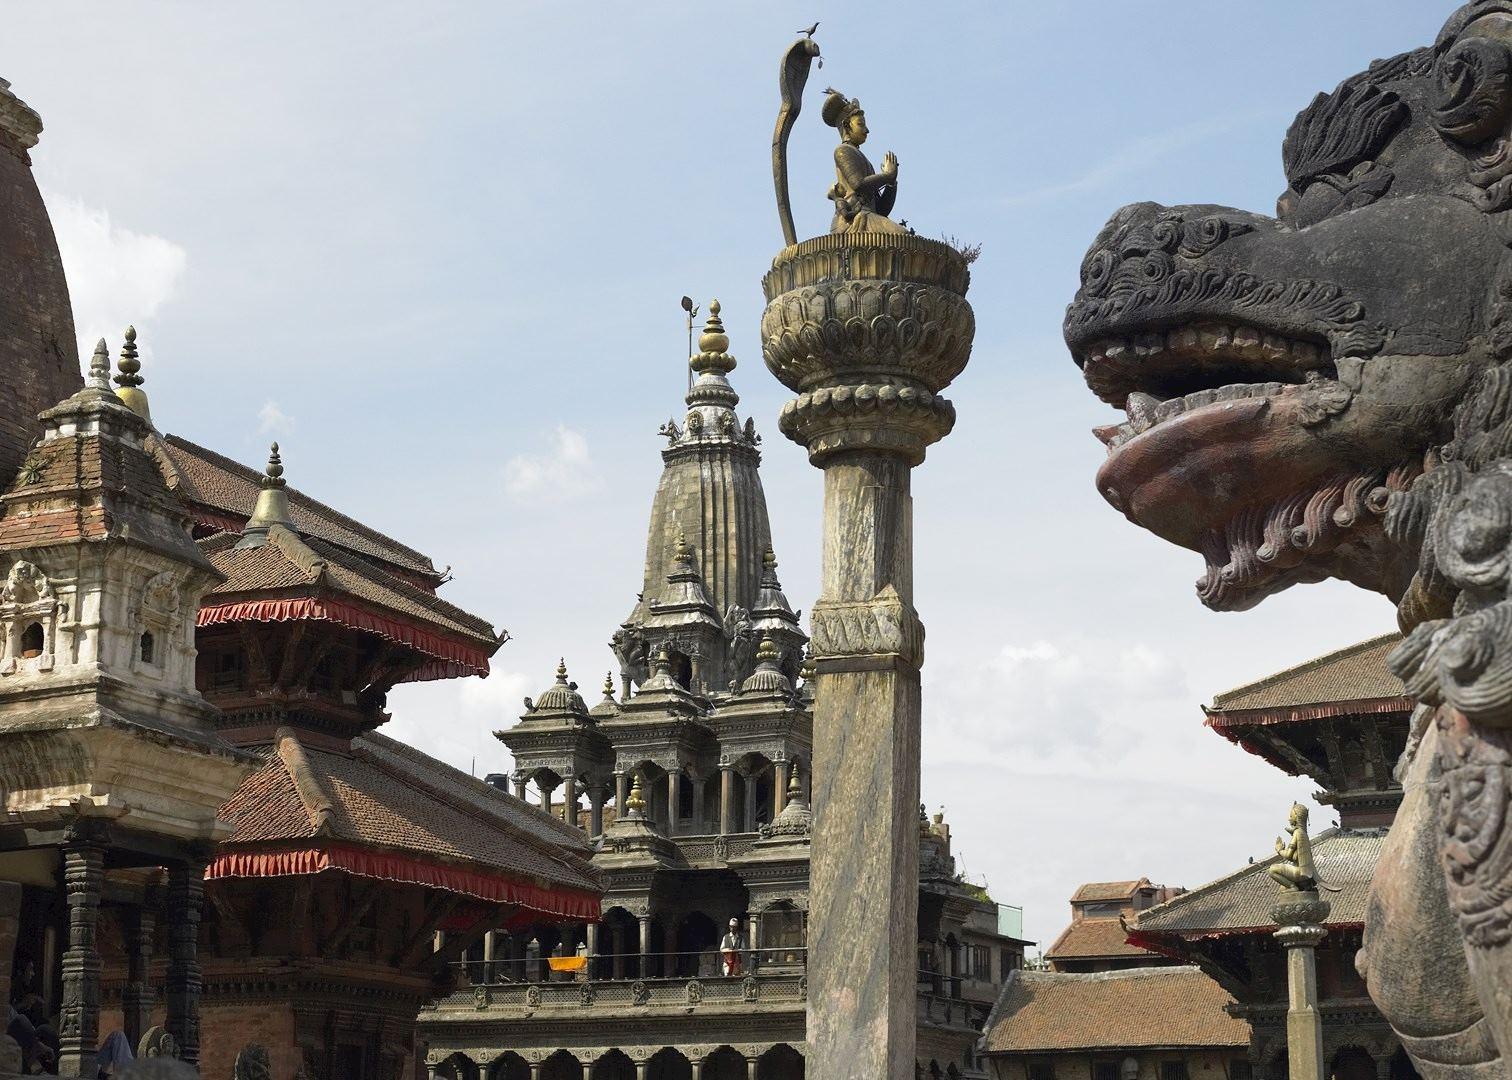 Visit Kathmandu on a trip to Nepal | Audley Travel